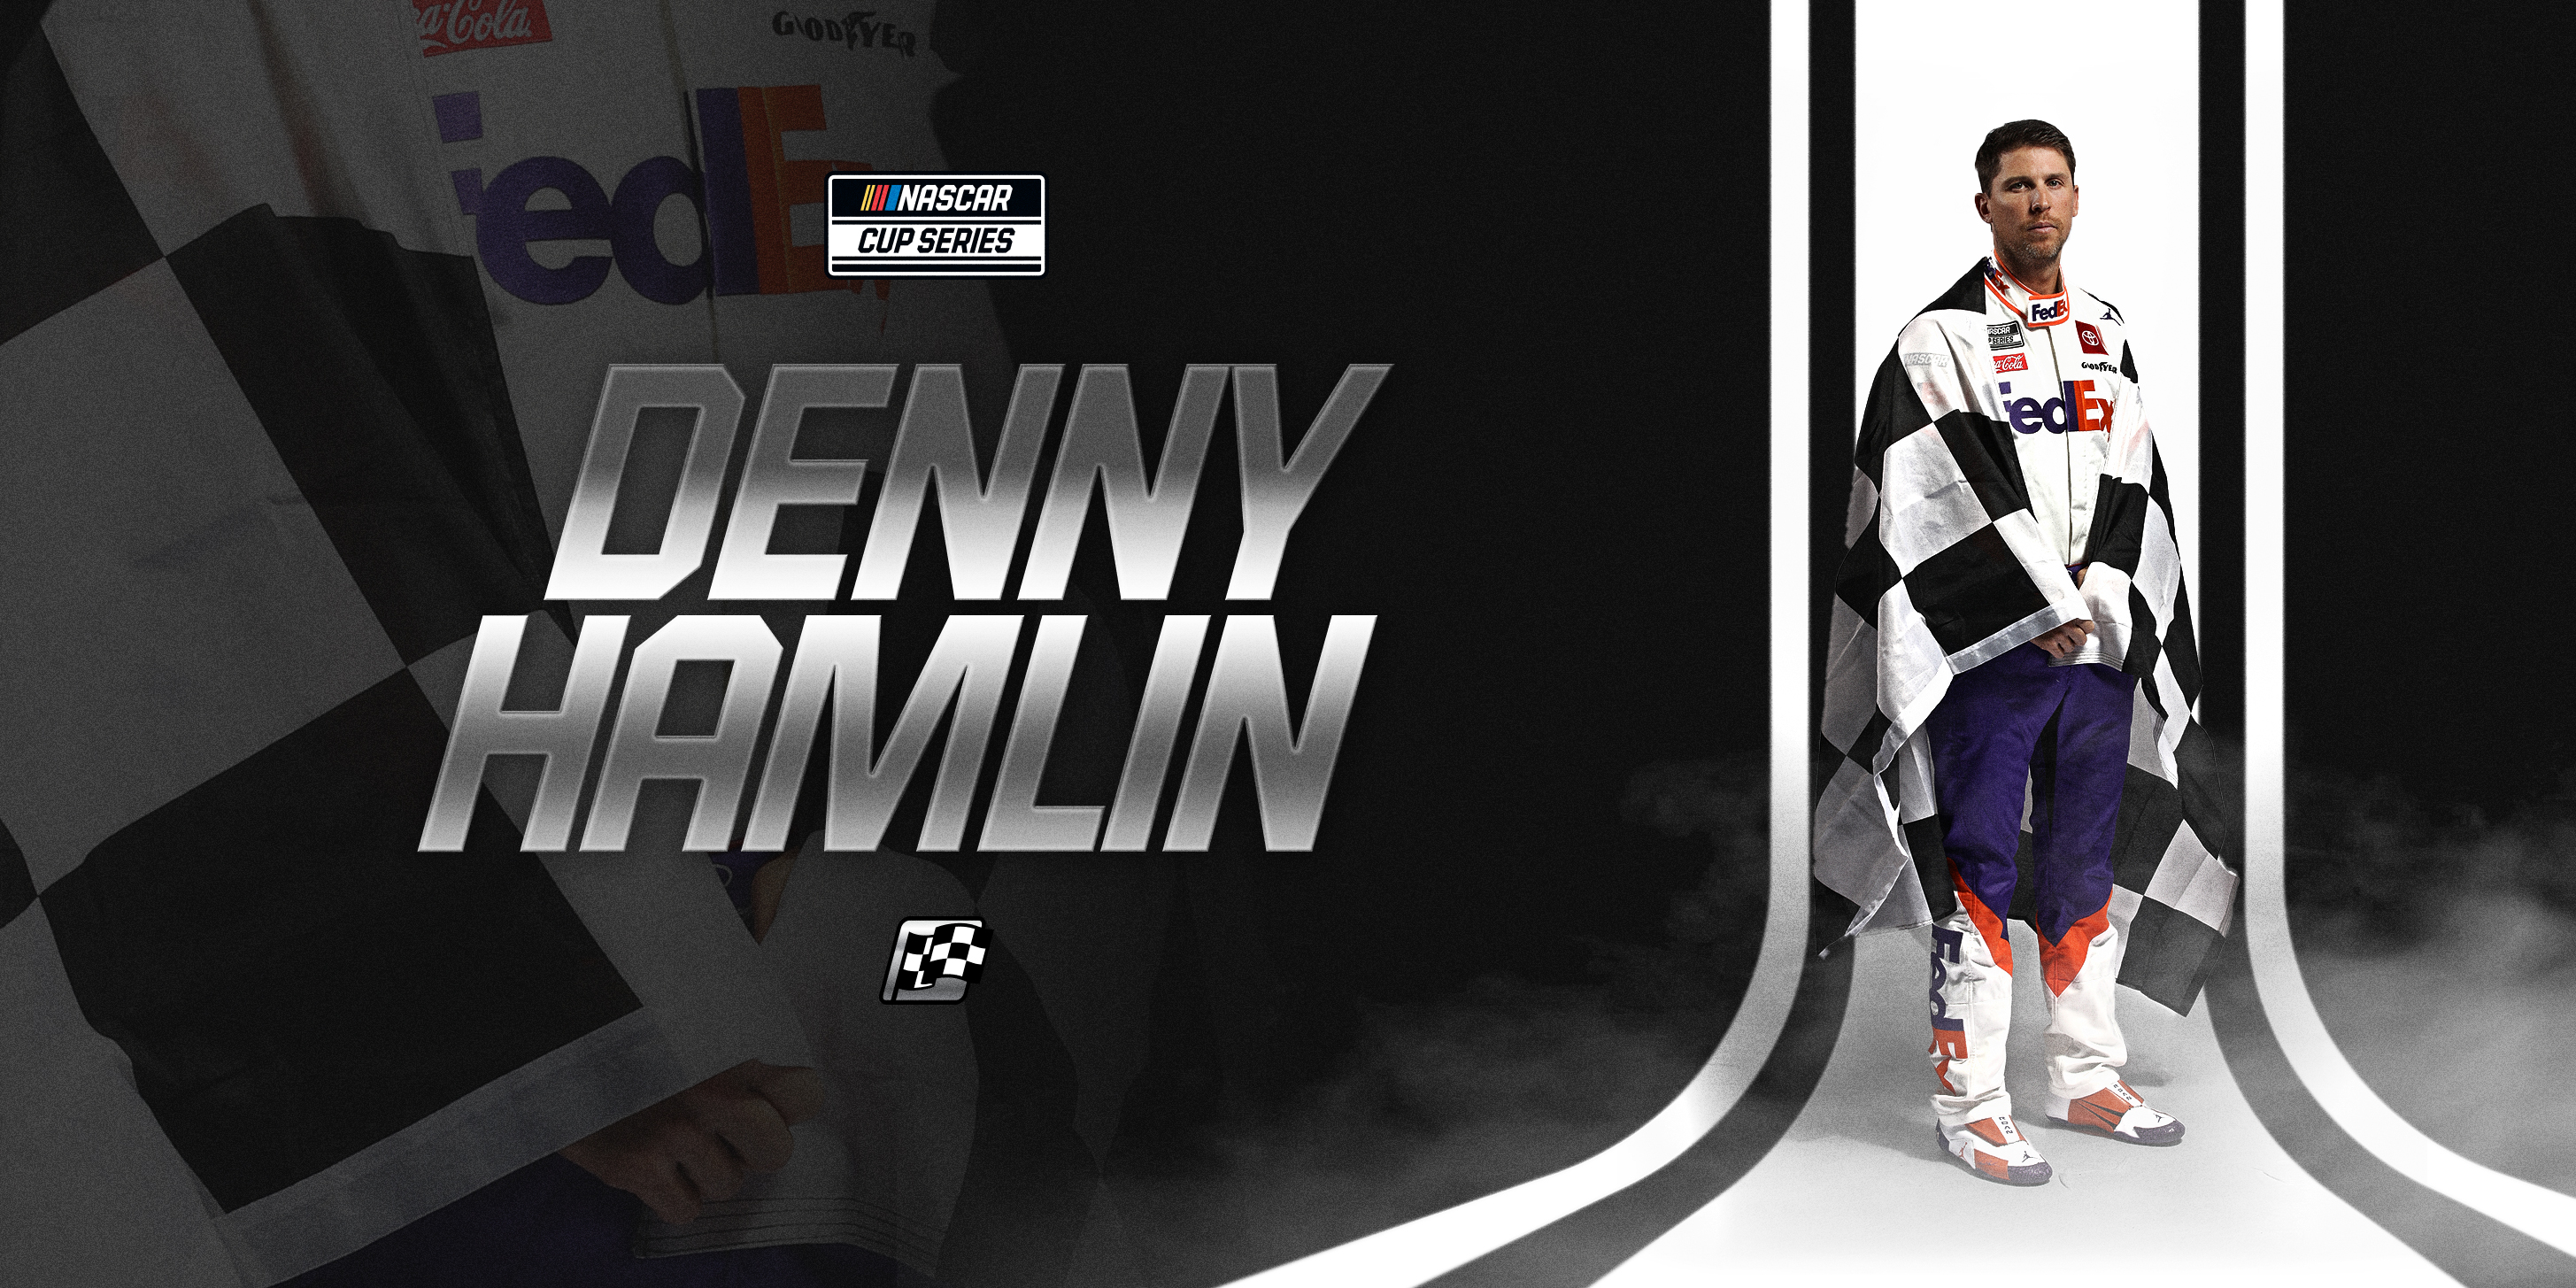 Denny Hamlin wins his third Daytona 500